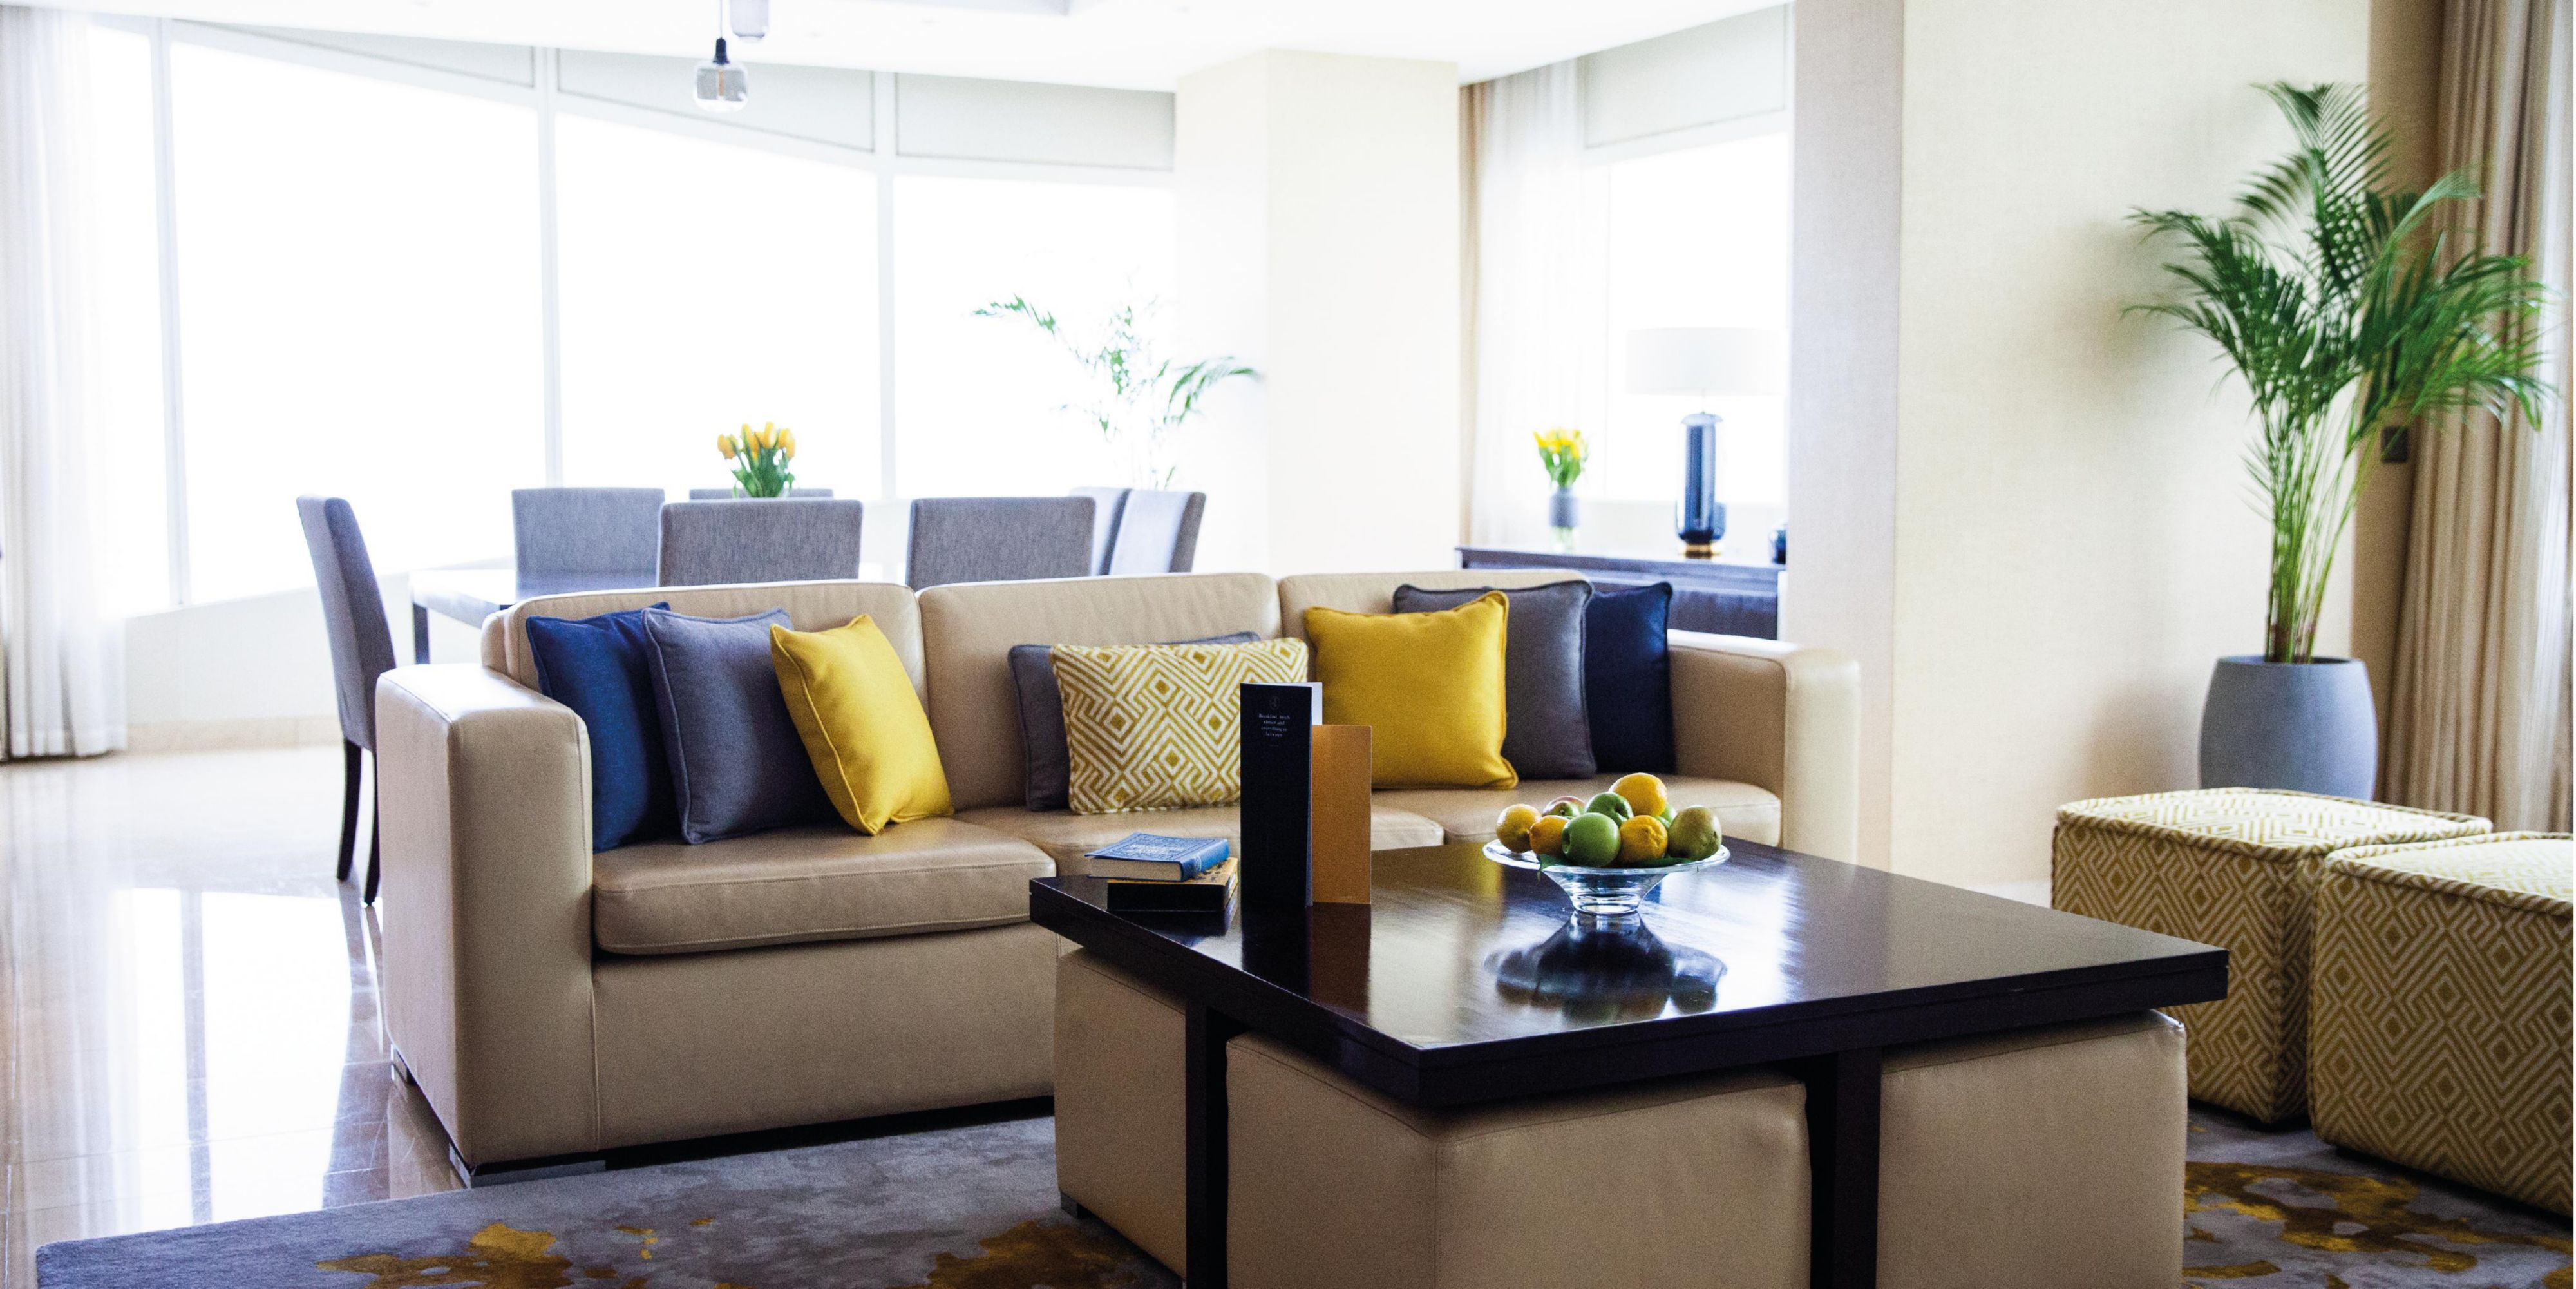 Ambassador Suite, living room, views of Jumeirah Beach